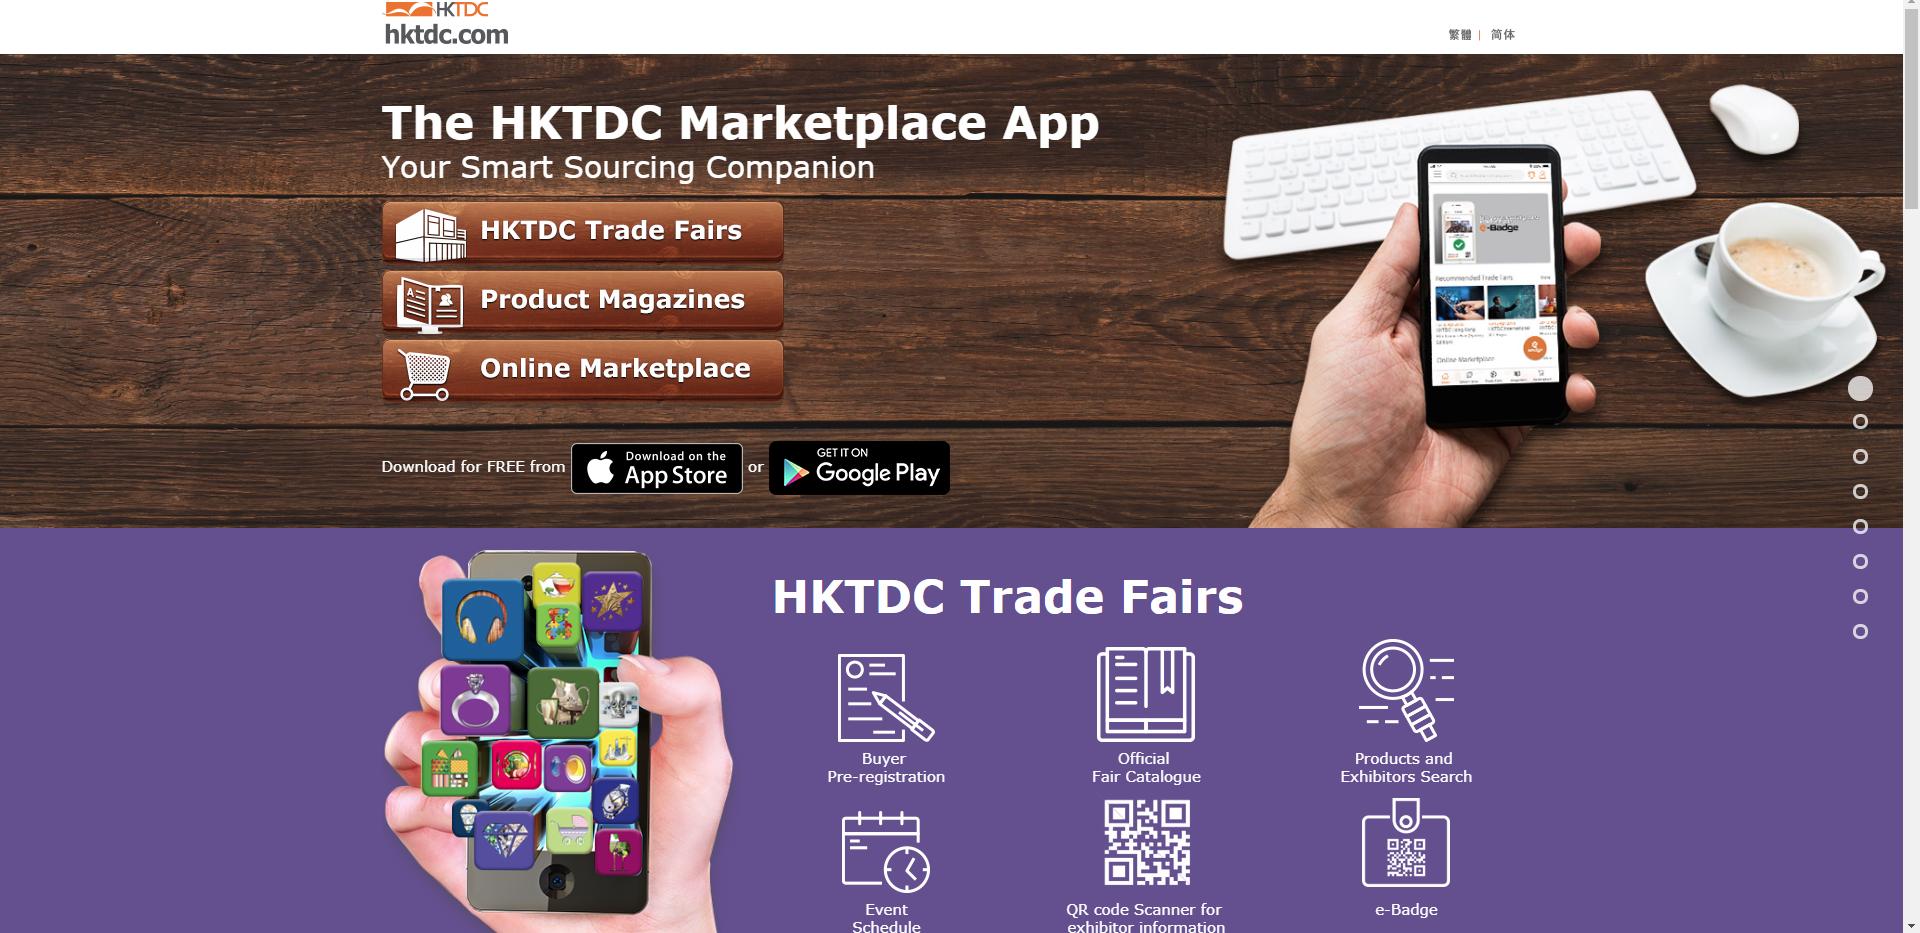 image of Hong Kong Trade Development Council Wins 2018 Best B2B Mobile Application, Best E-Zine Mobile Application, Best International Business Mobile Application Mobile WebAward for HKTDC Marketplace App